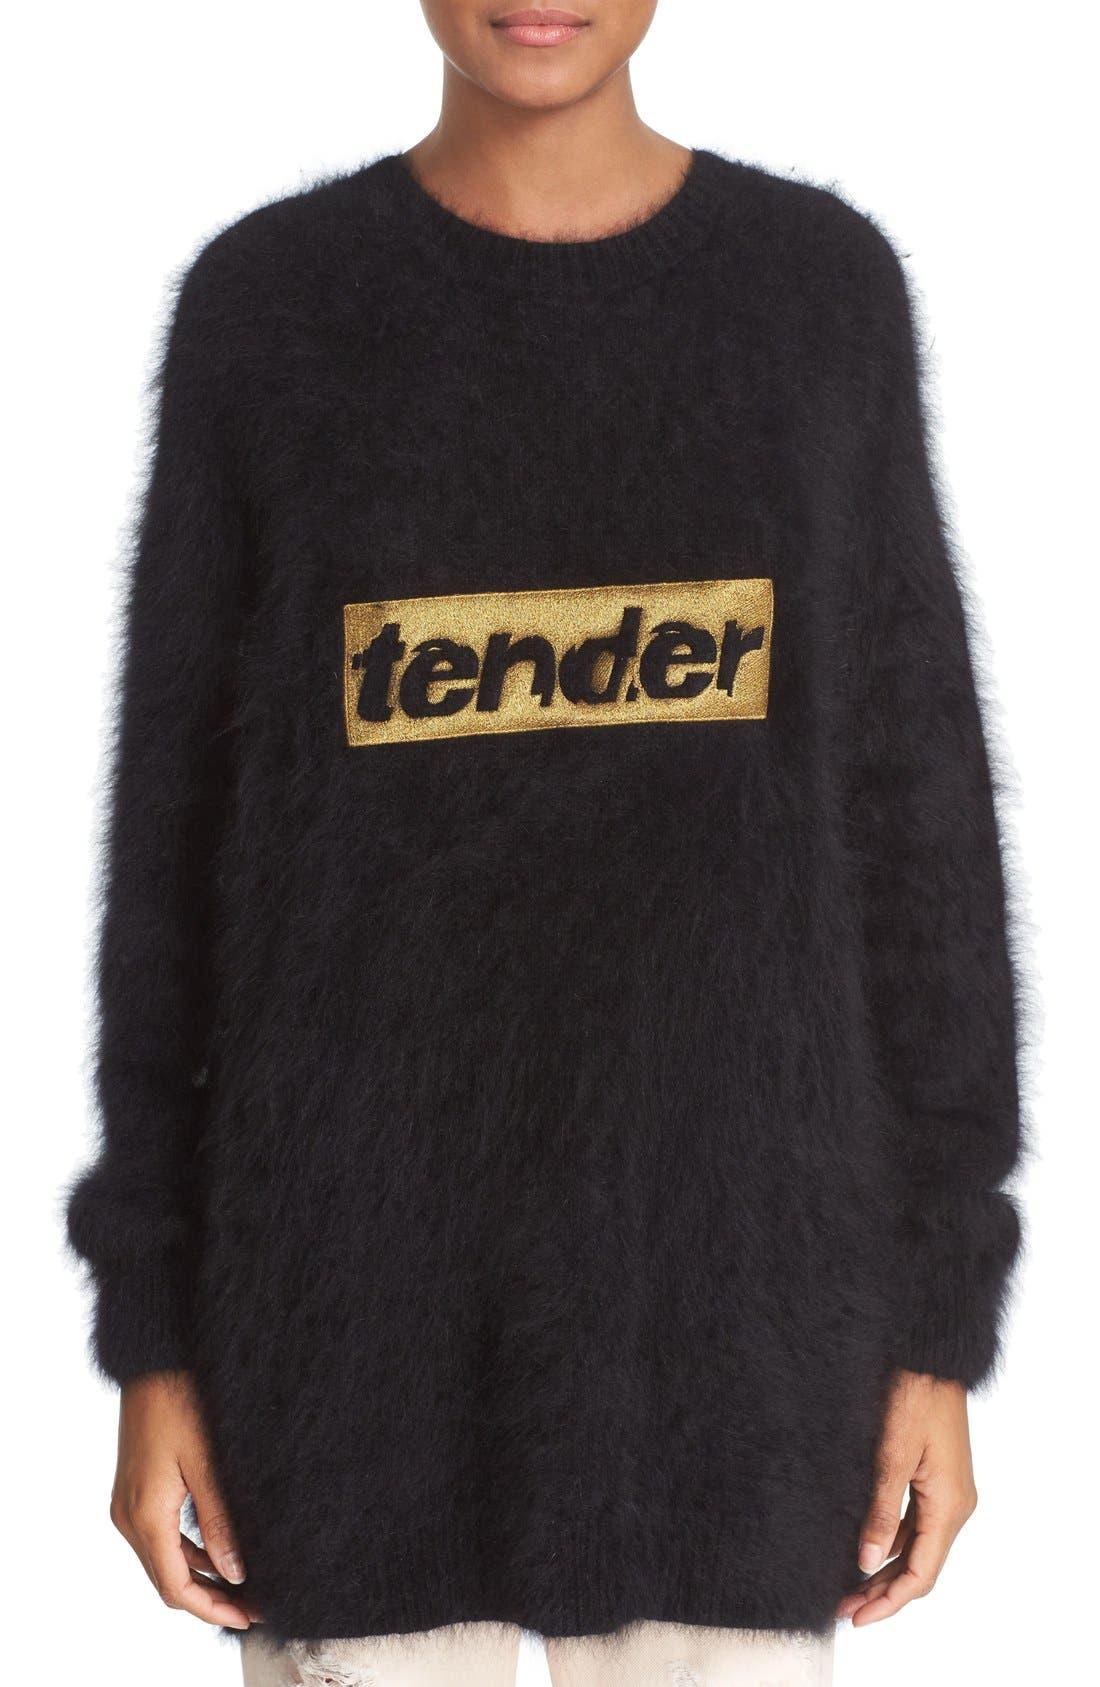 Main Image - Alexander Wang 'Tender' Embroidered Wool Blend Sweater